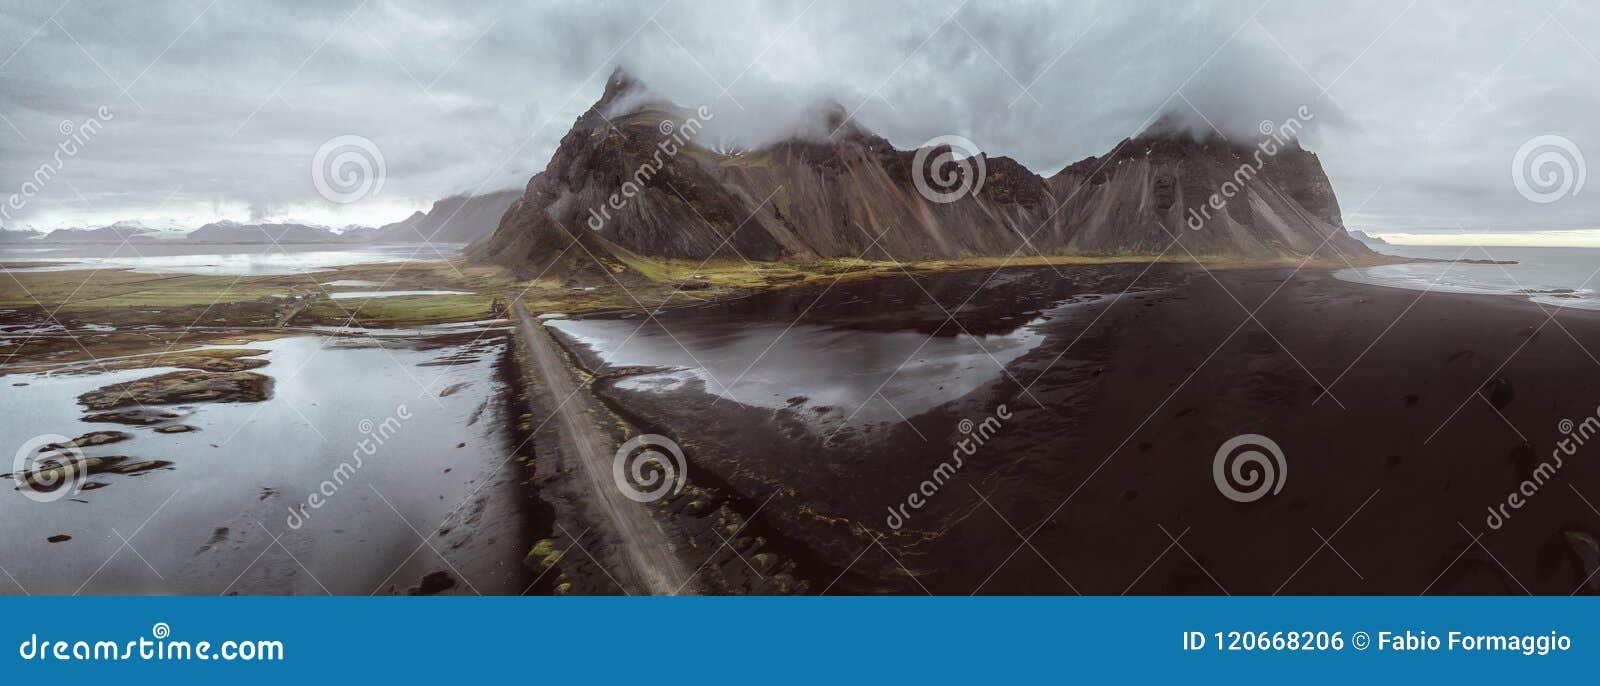 Panorami islandesi, vista aerea sulle terre